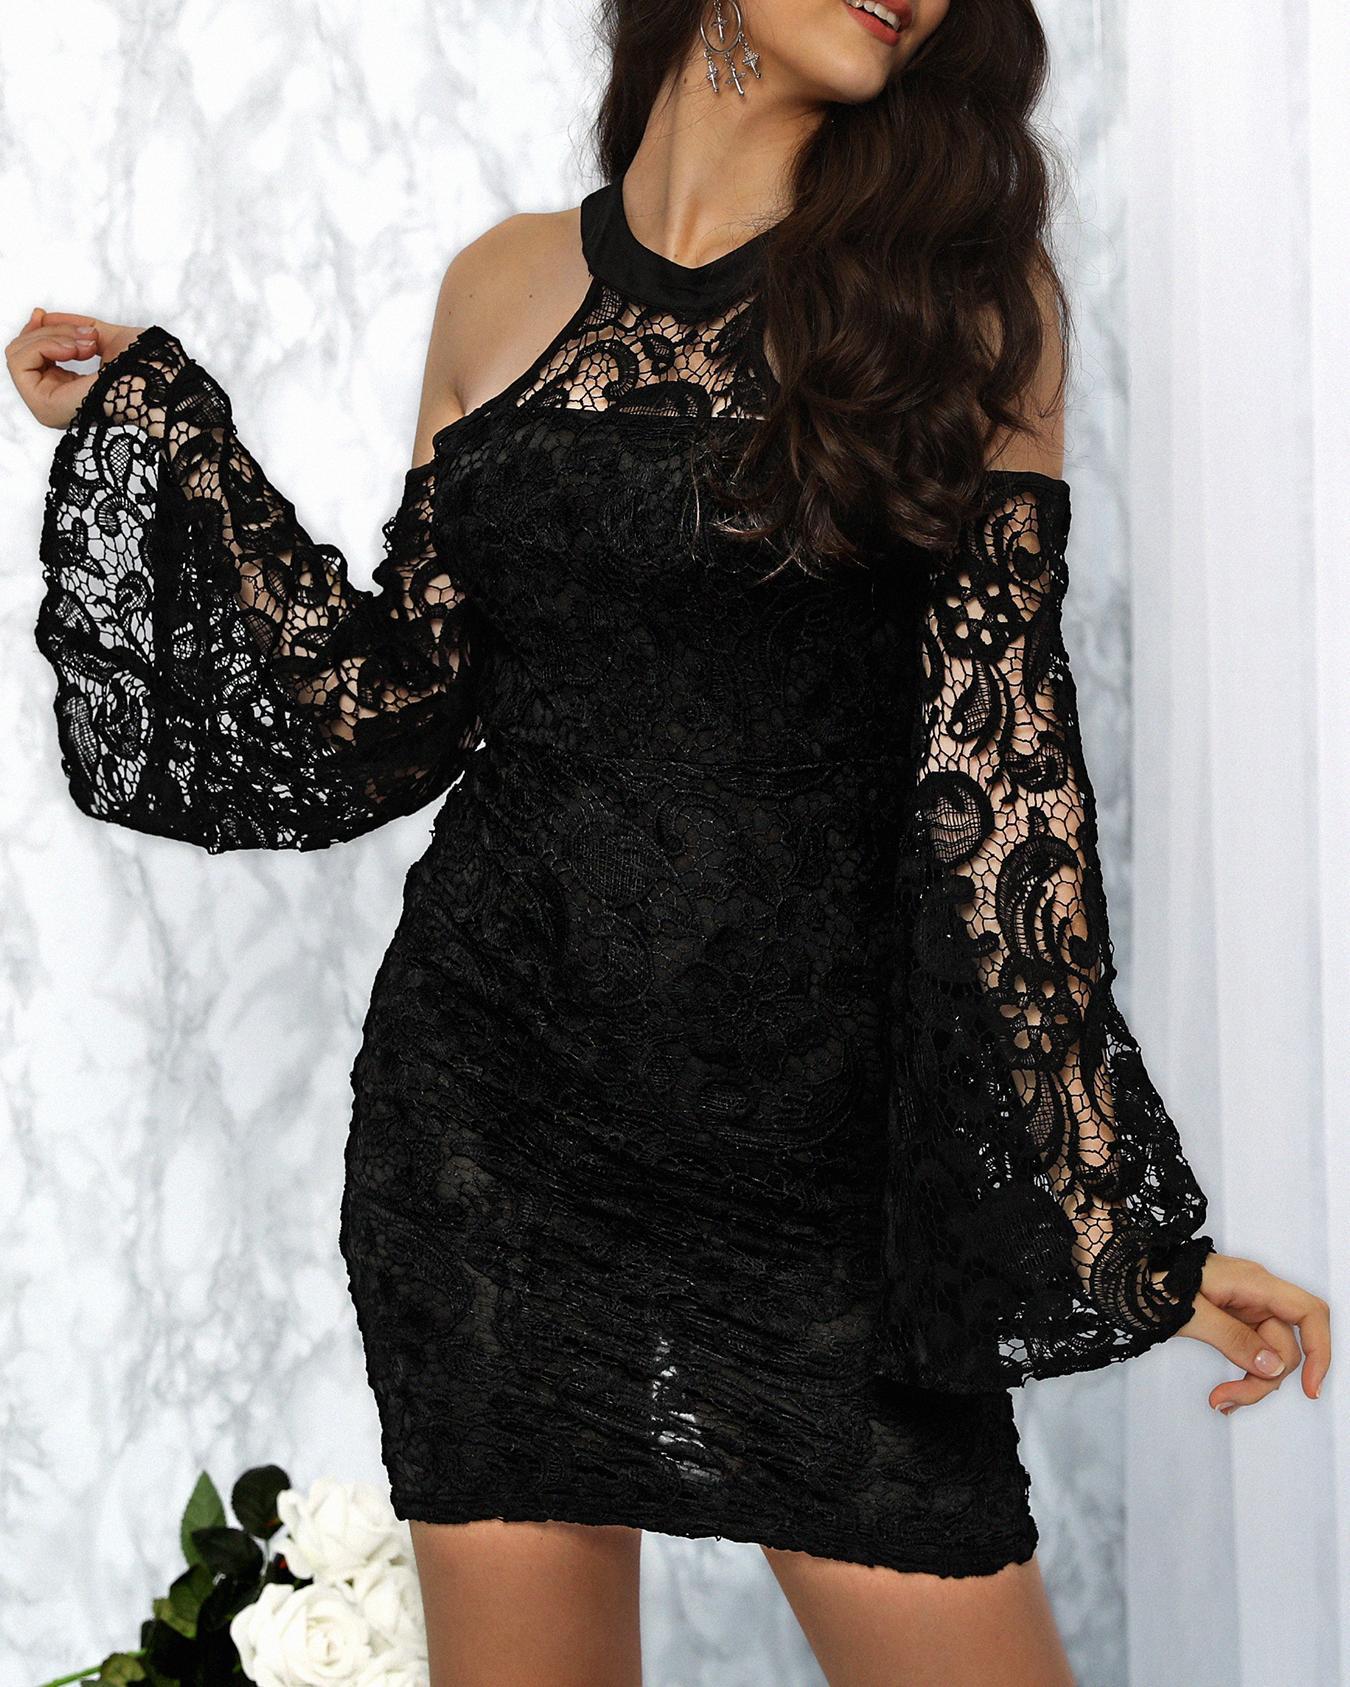 Joyshoetique coupon: Lace Halter Cold Shoulder Flared Sleeve Midi Dress